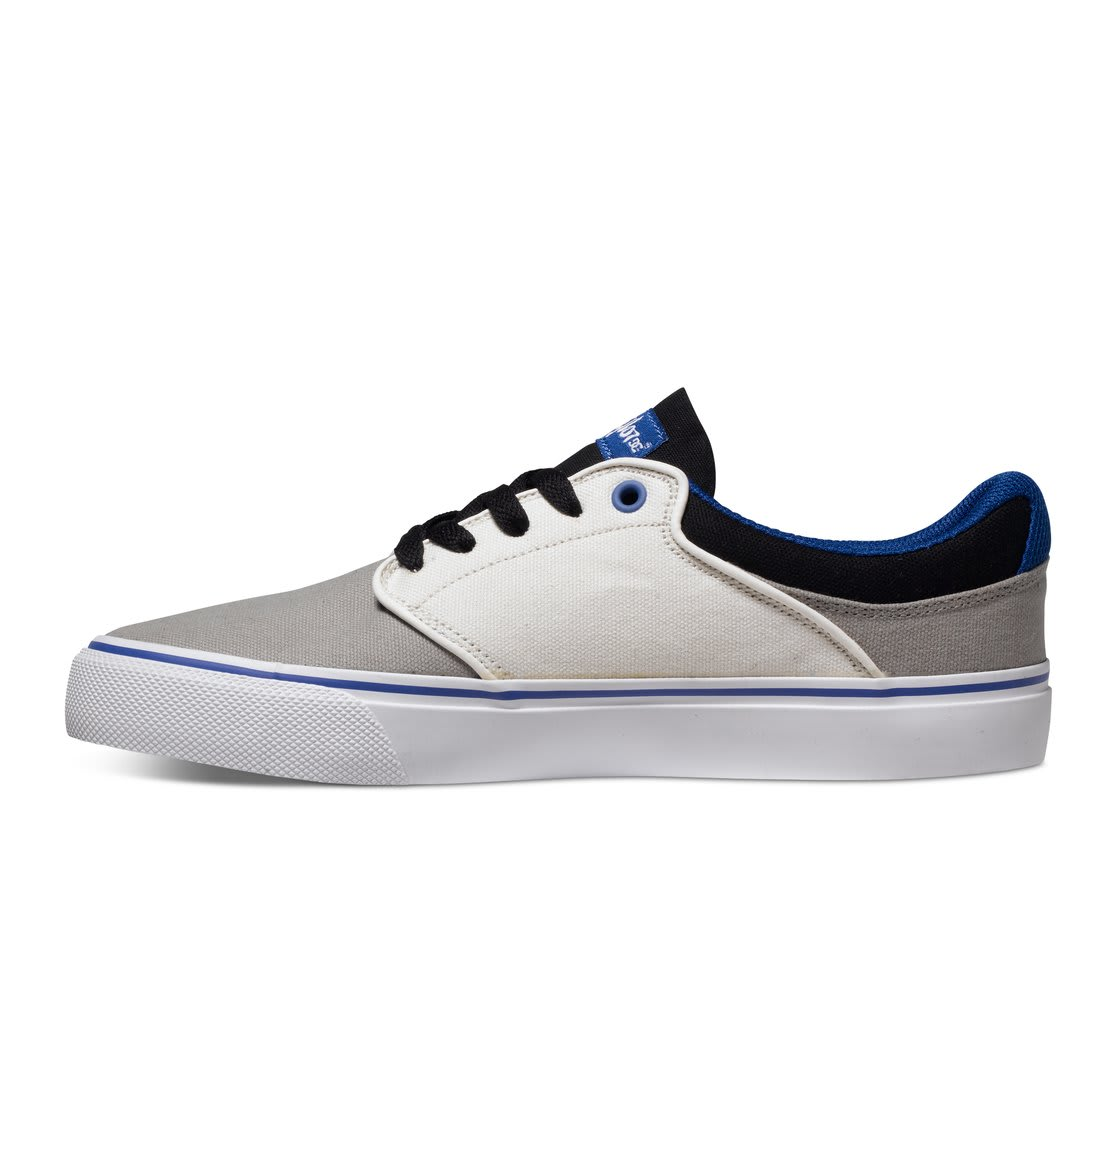 Lacing Dc Skate Shoes